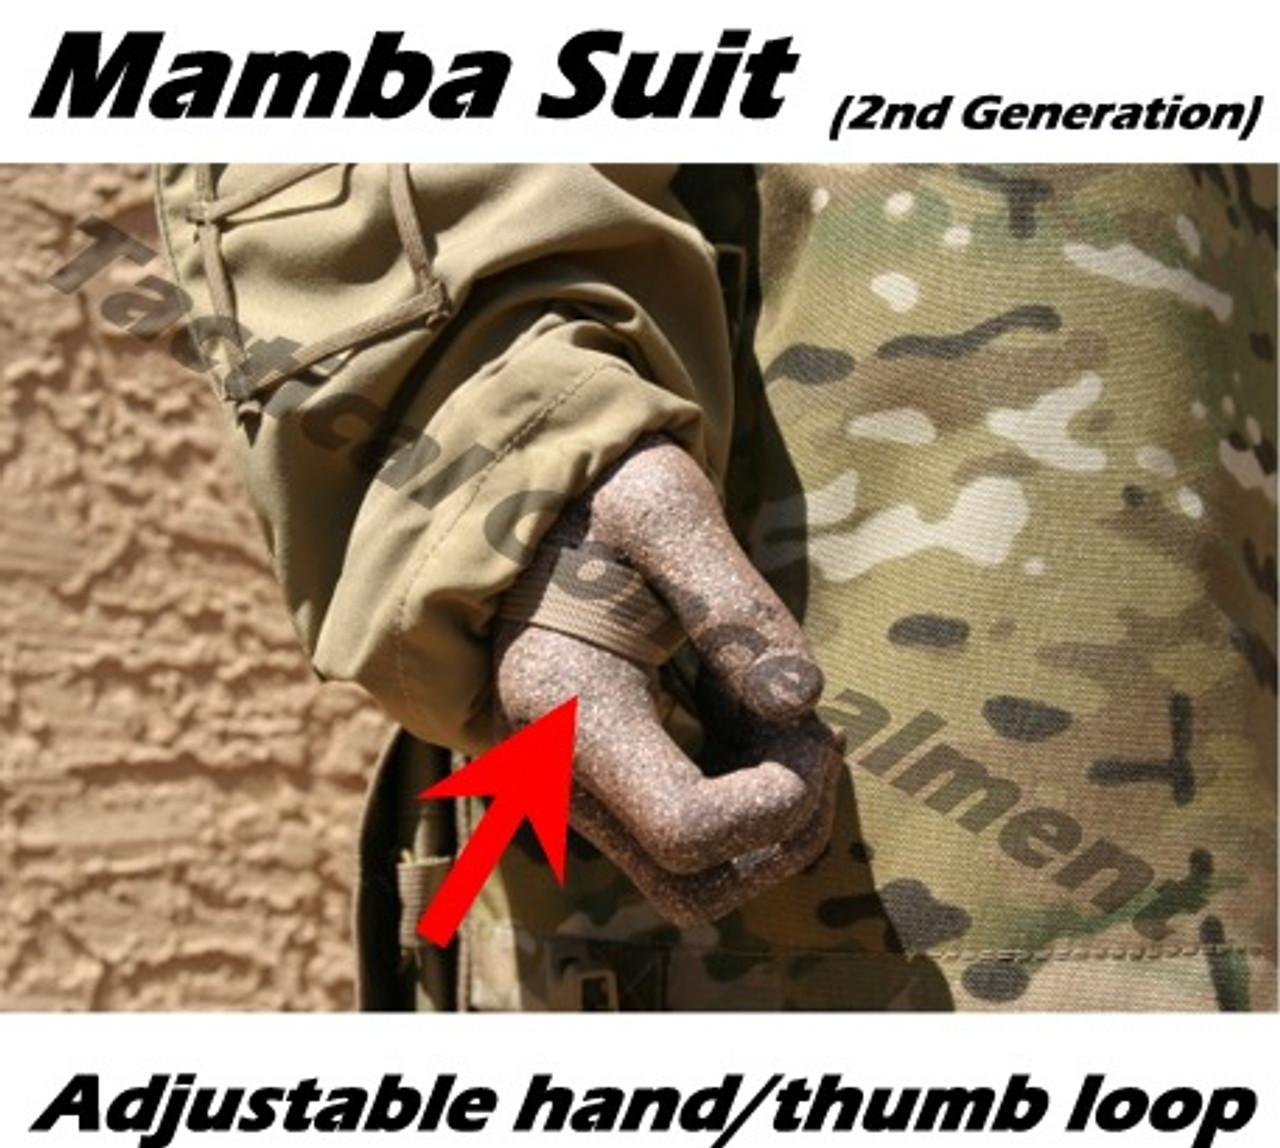 Mamba Suit